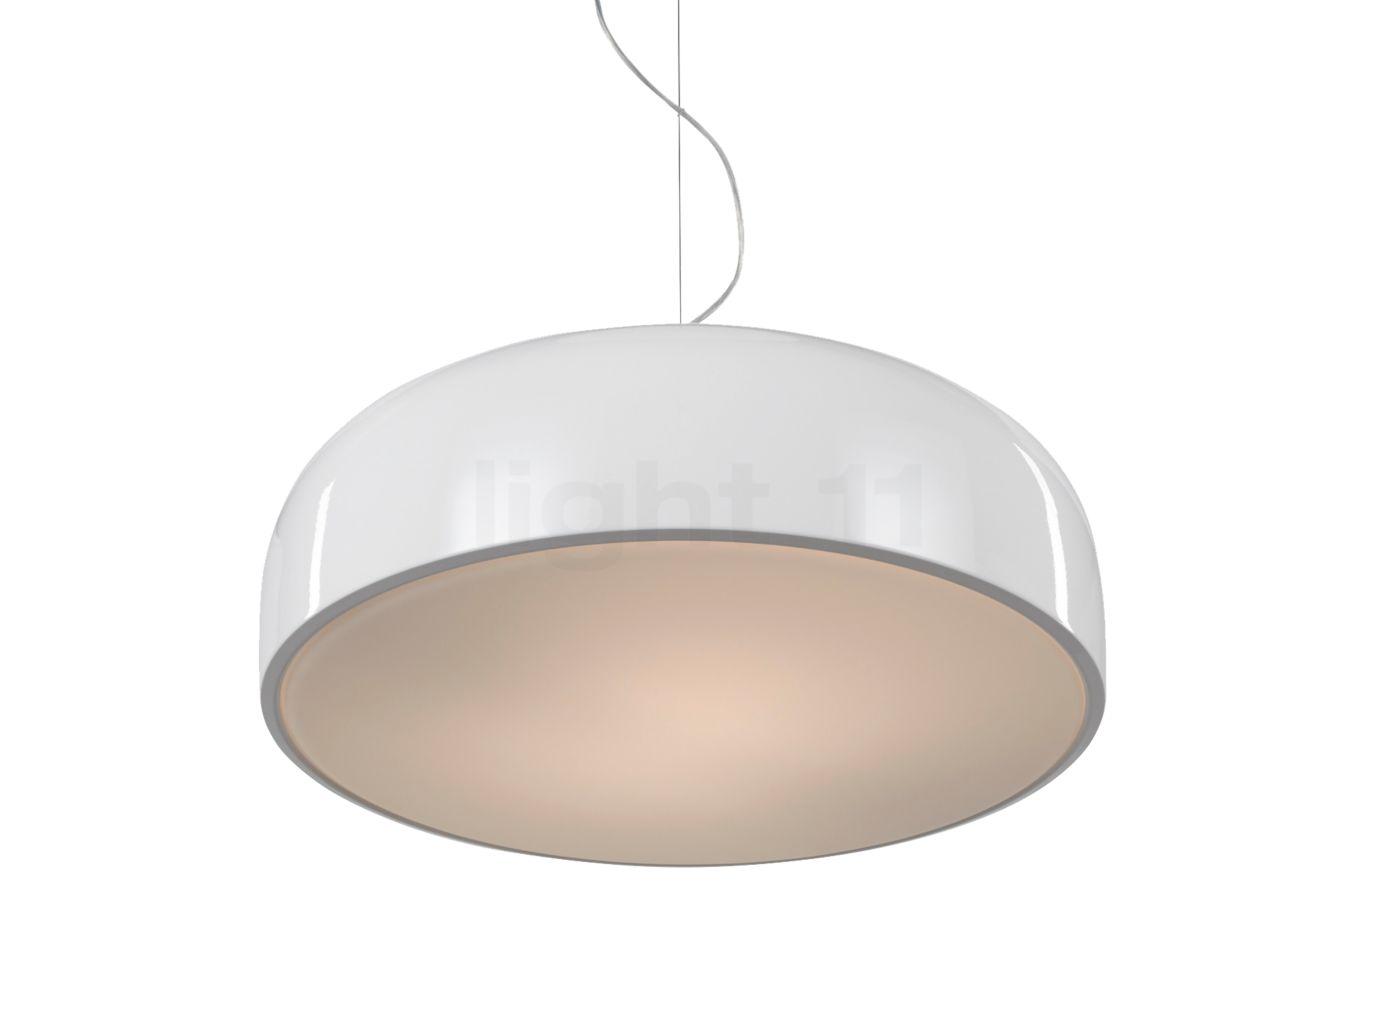 Plafoniera Flos Smithfield : Flos smithfield s led light